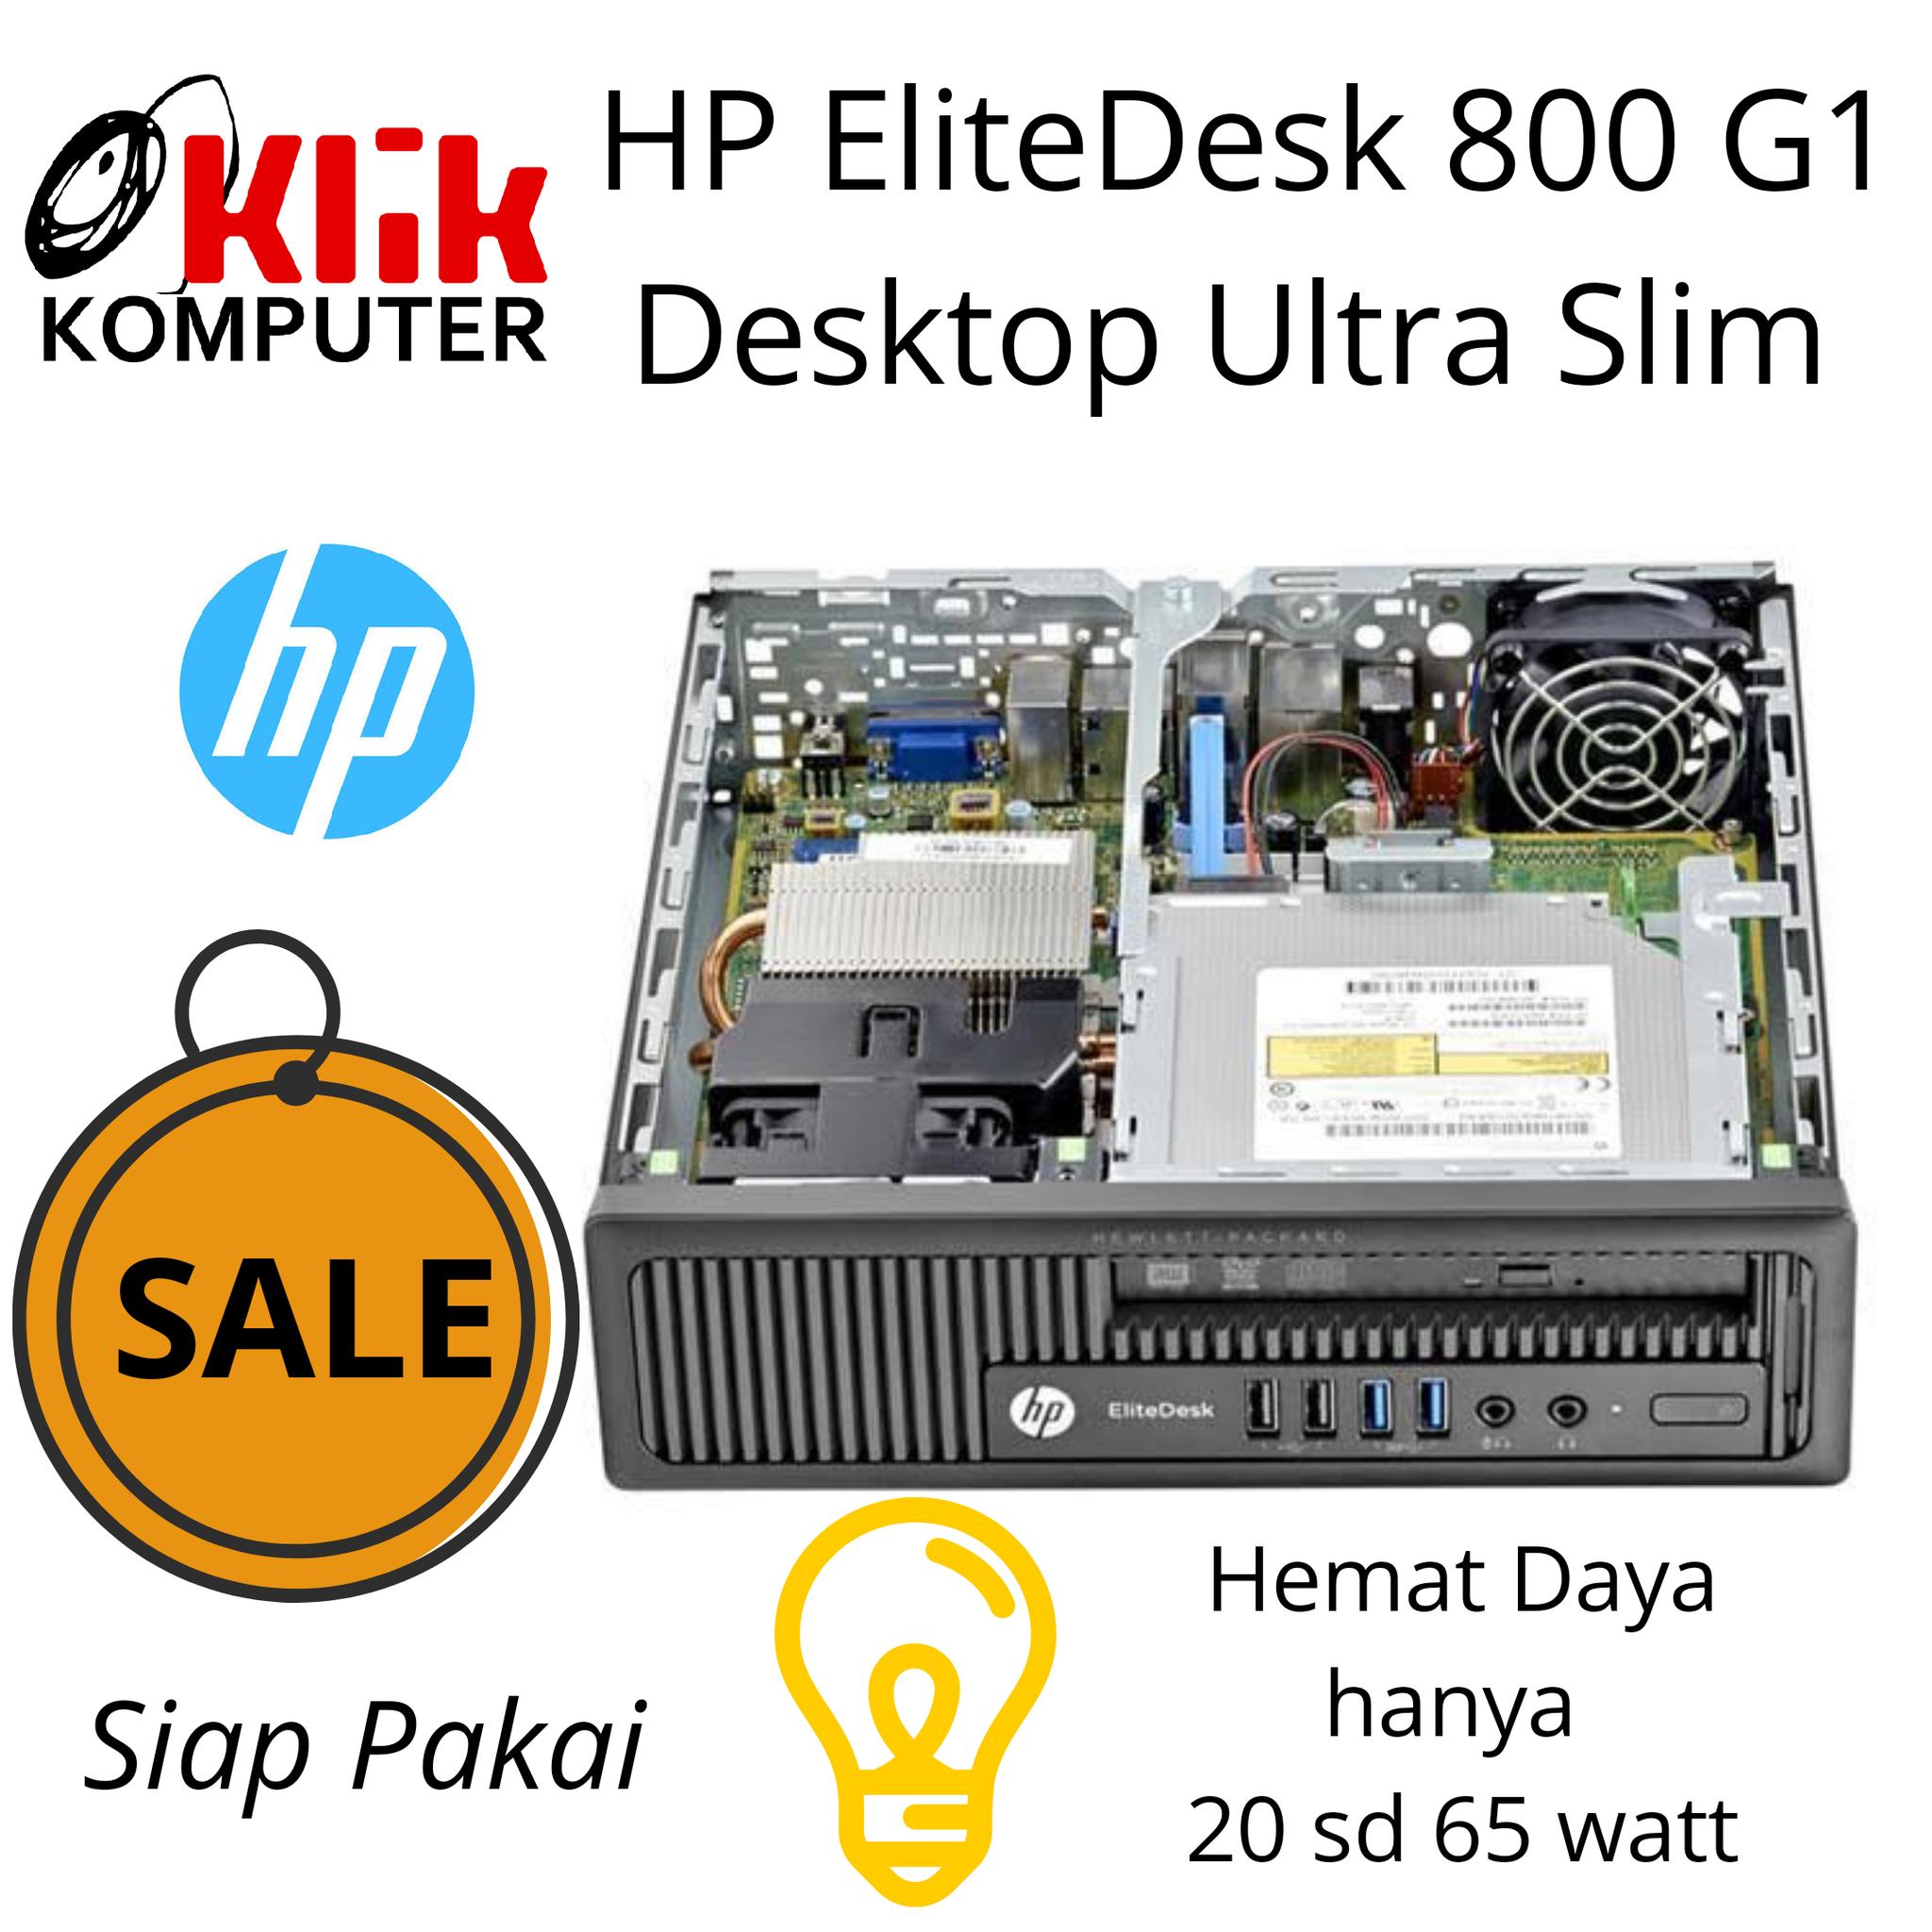 Jual HP EliteDesk 800 G1 Ultra Slim Desktop Business PC Core I5